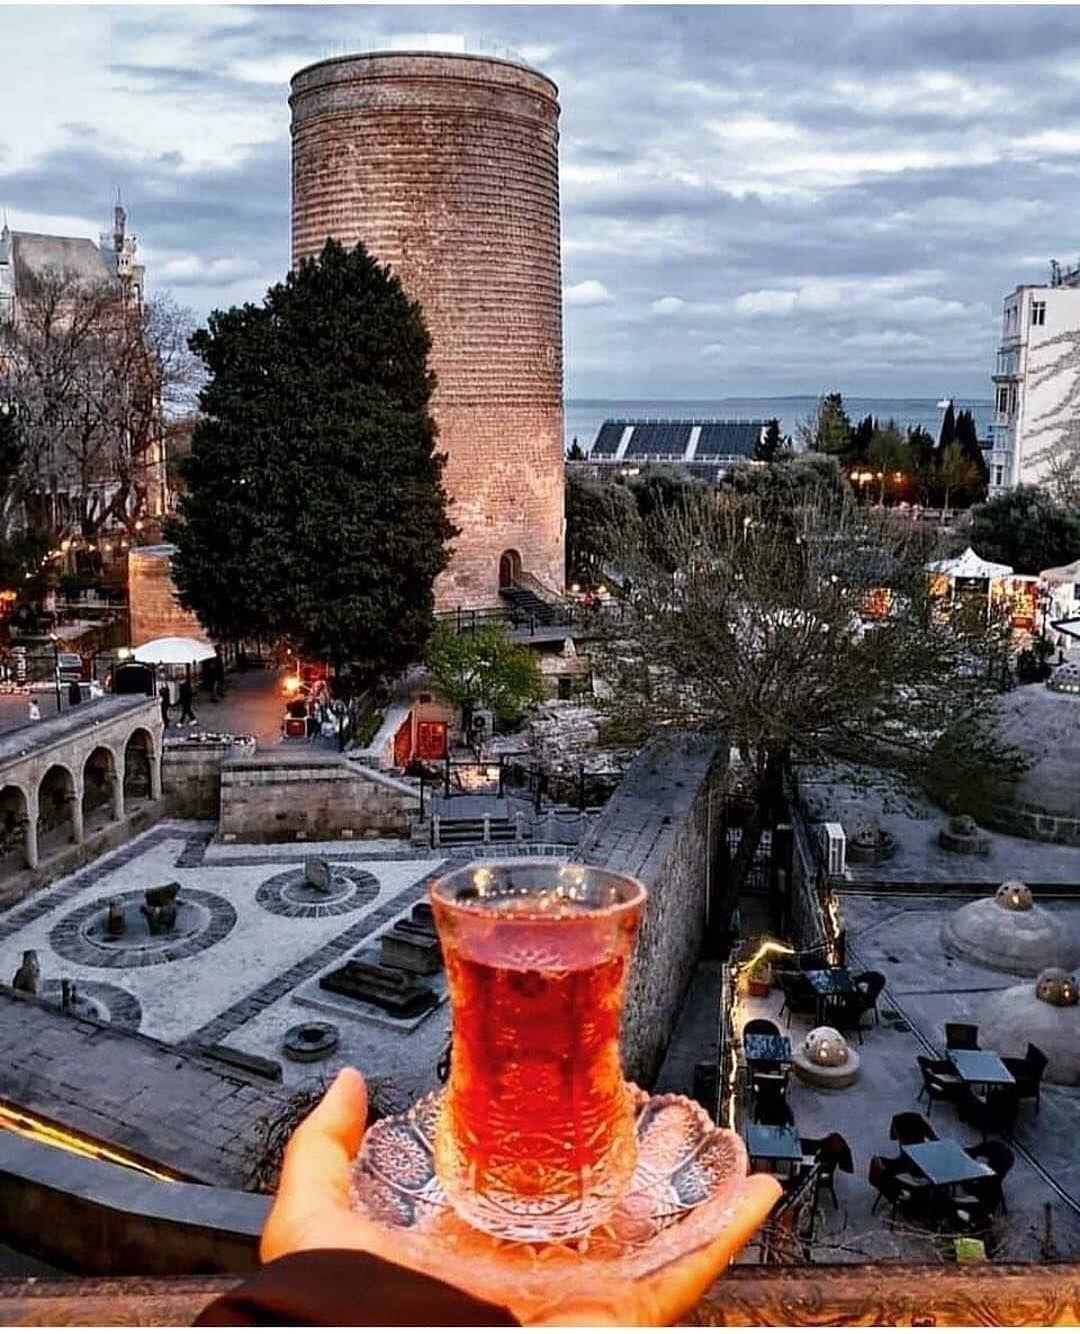 New The 10 Best Travel Today With Pictures Travel Baku City Azerbaijan Travel Azerbaijan Flag